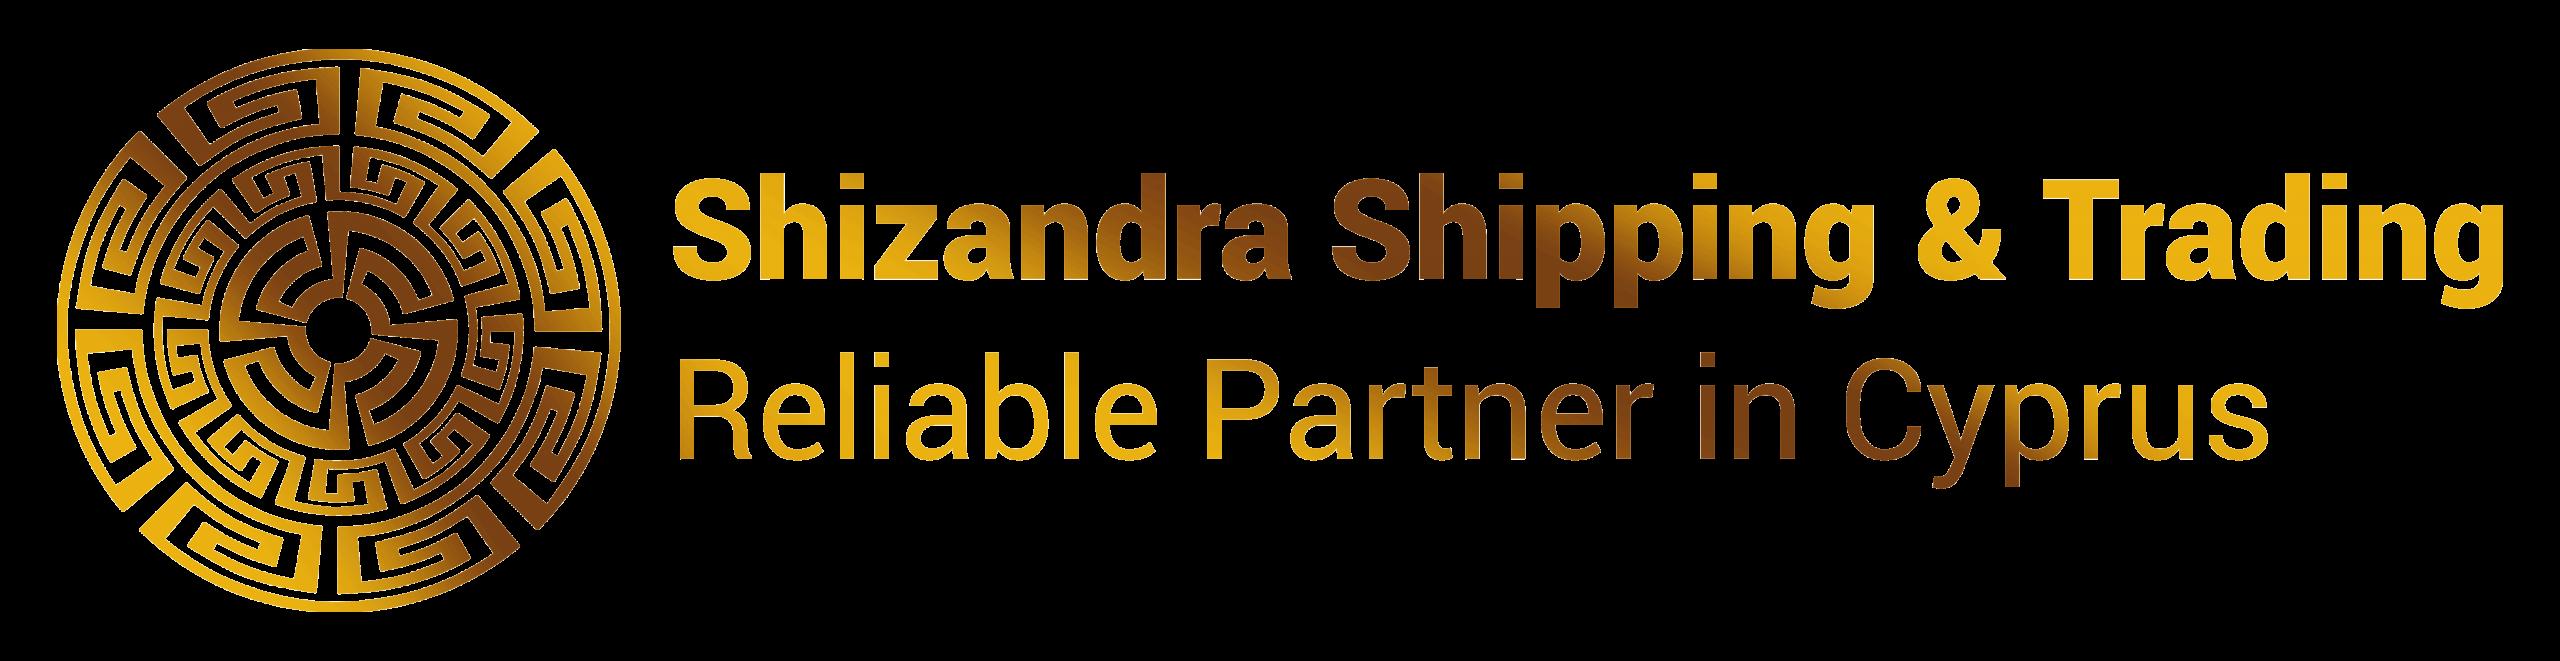 Shizandra Shipping & Trading Logo